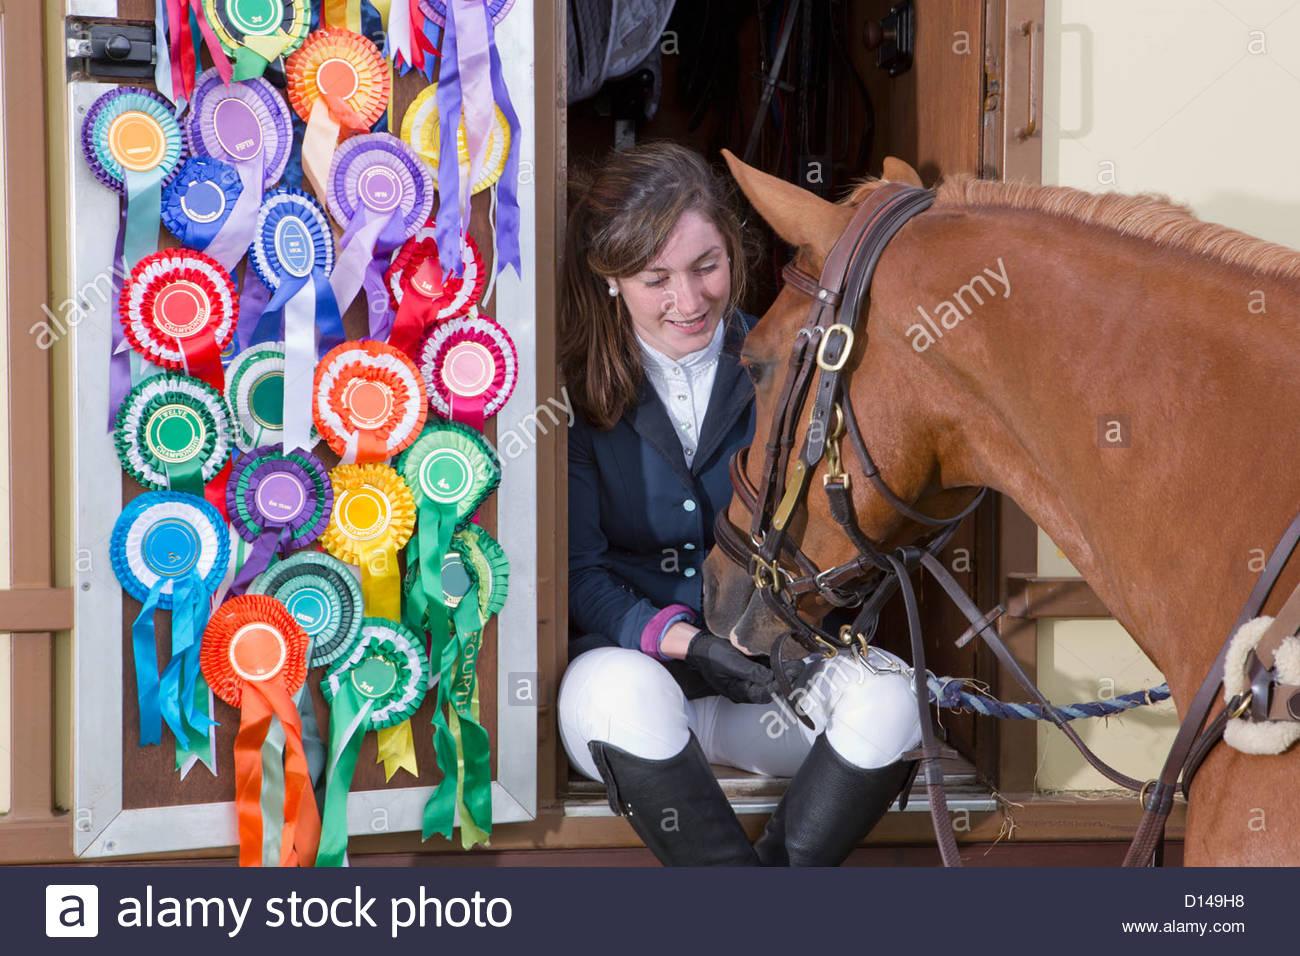 Girl in equestrian uniform feeding horse in doorway of trailer with rosettes covering door - Stock Image